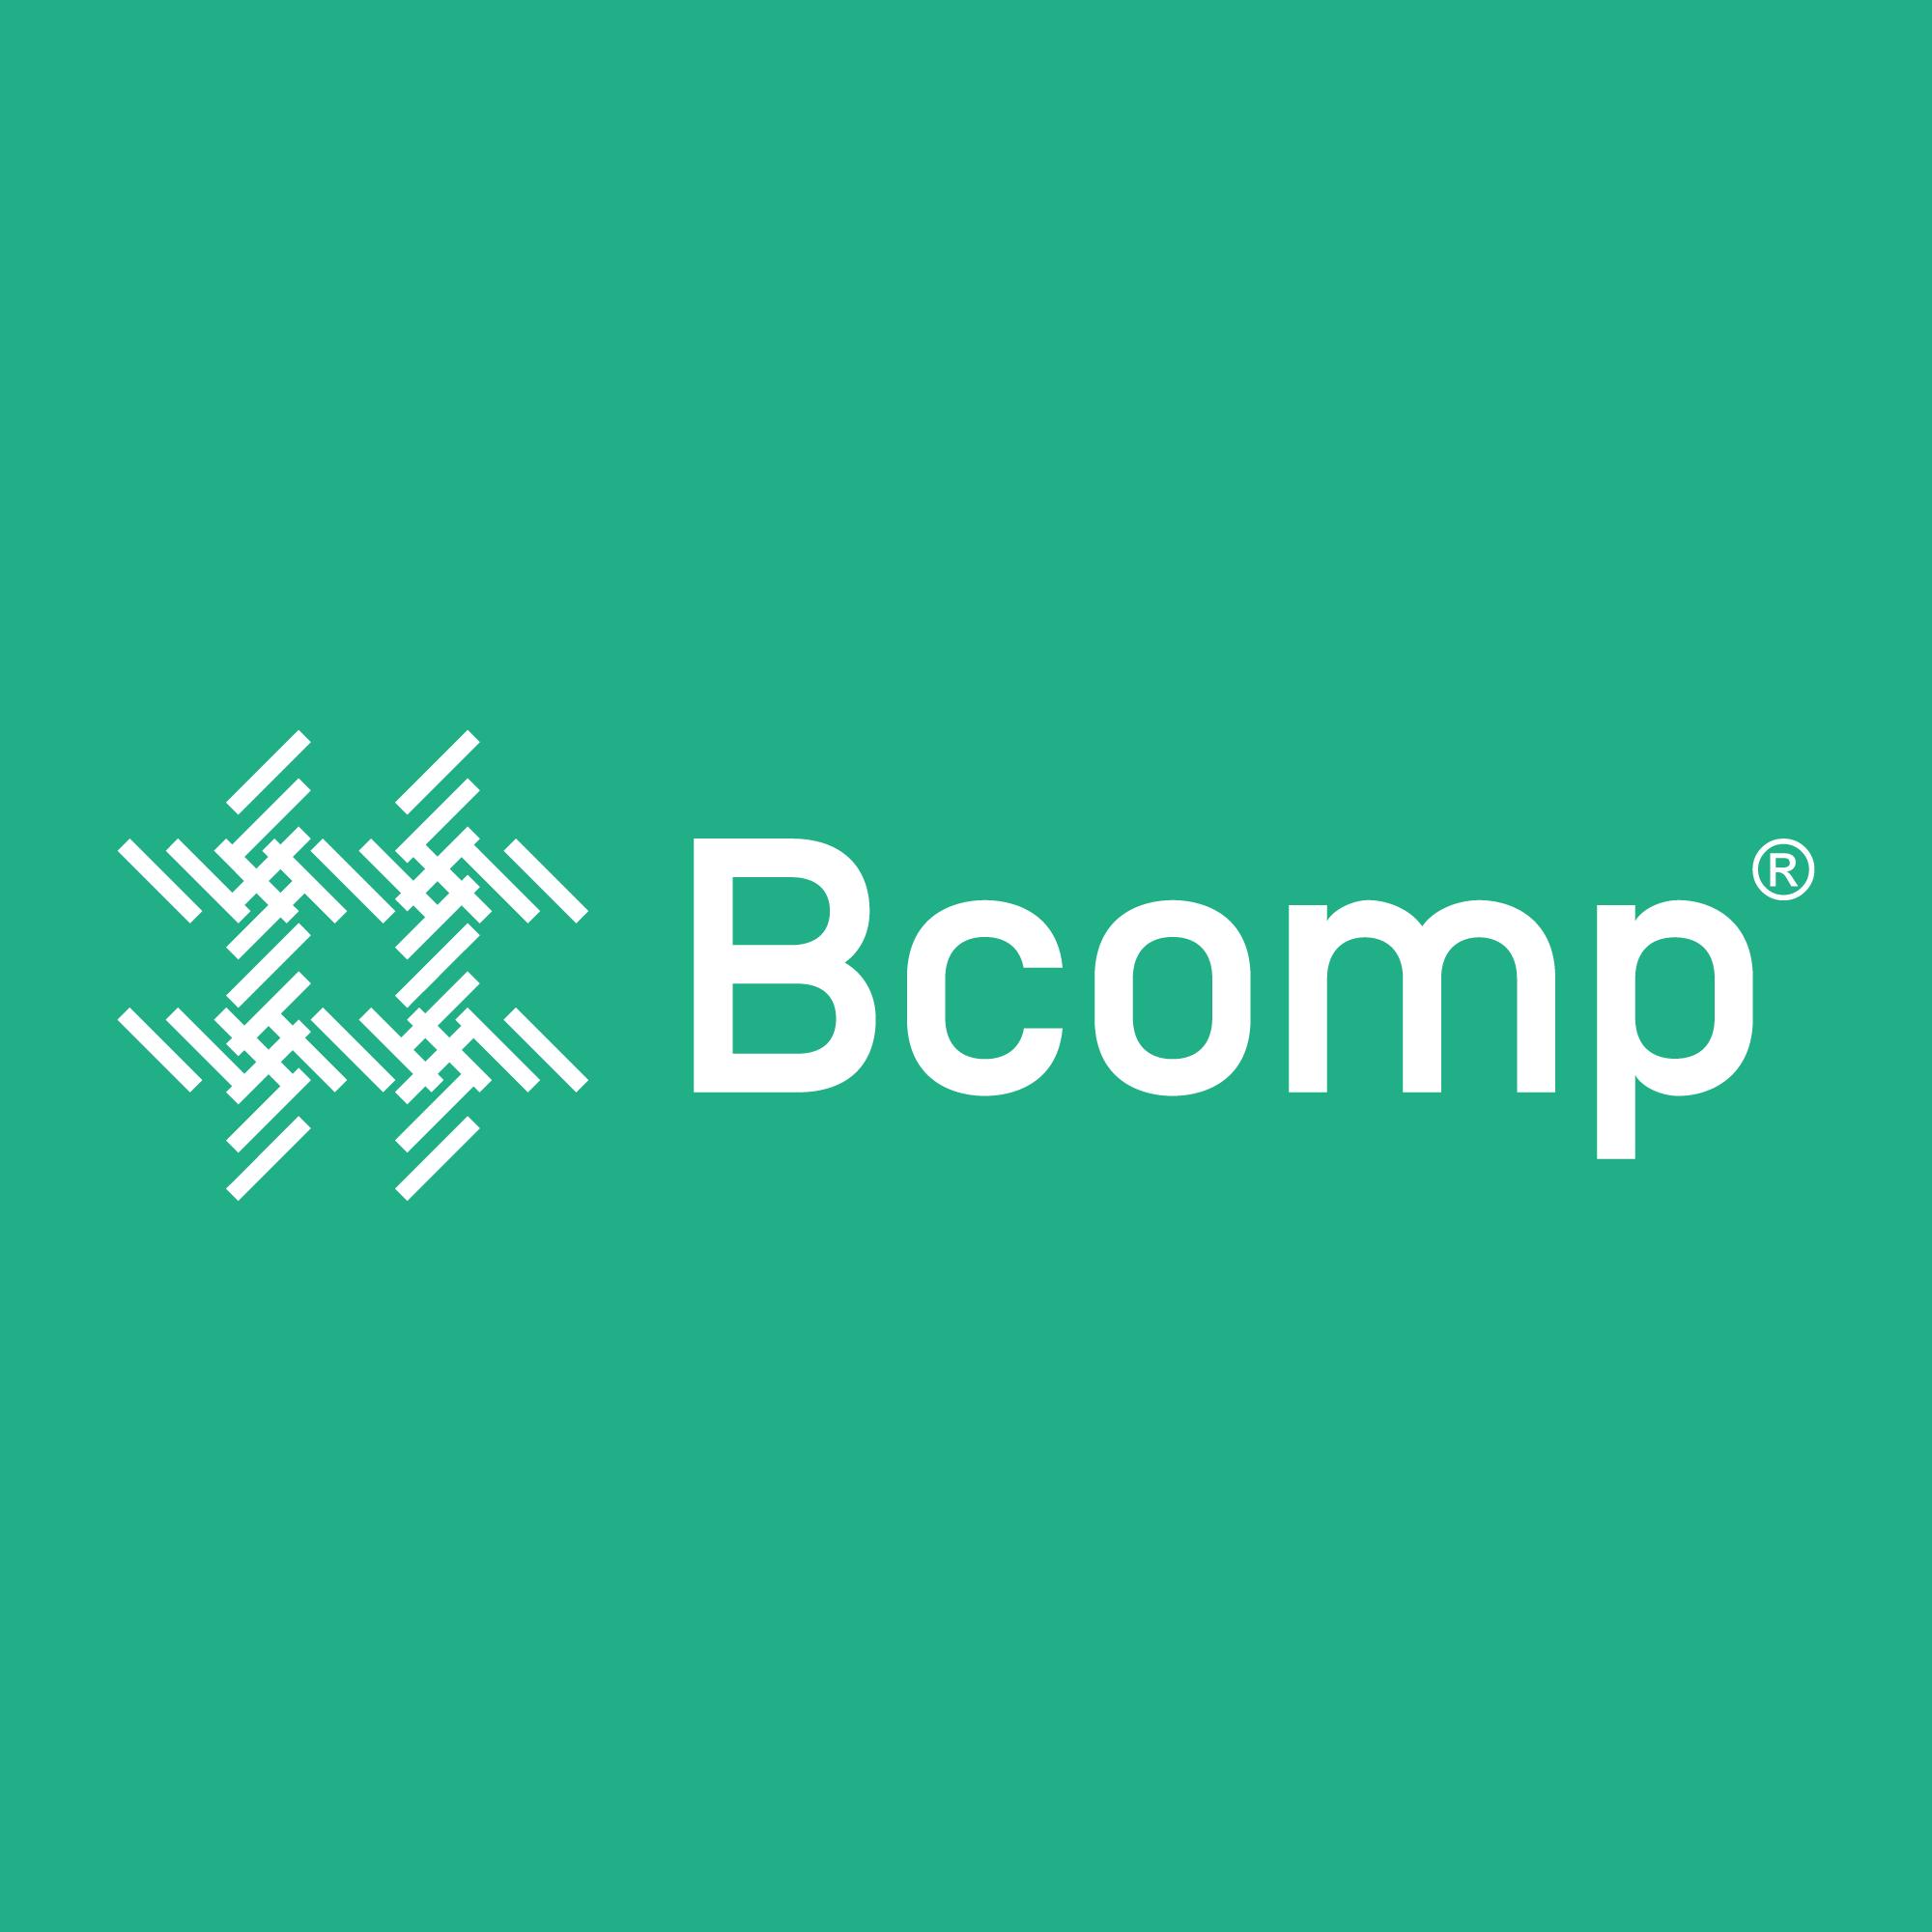 Marine-Speaker-Bcomp